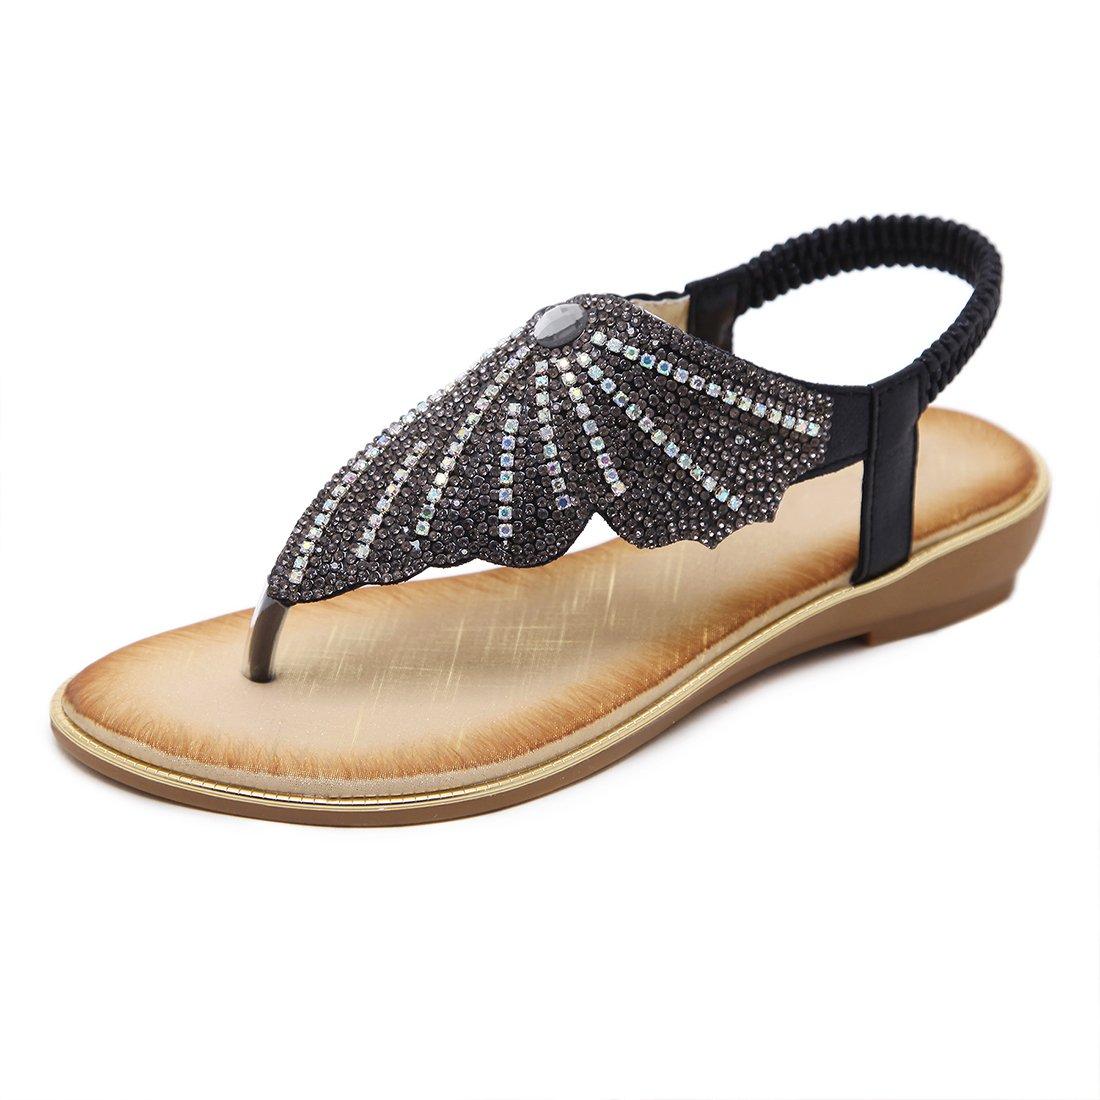 Women's Rhinestone Flat Sandals Glitter Shoes T-Strap Wedding Thong Sandals 3015 Black